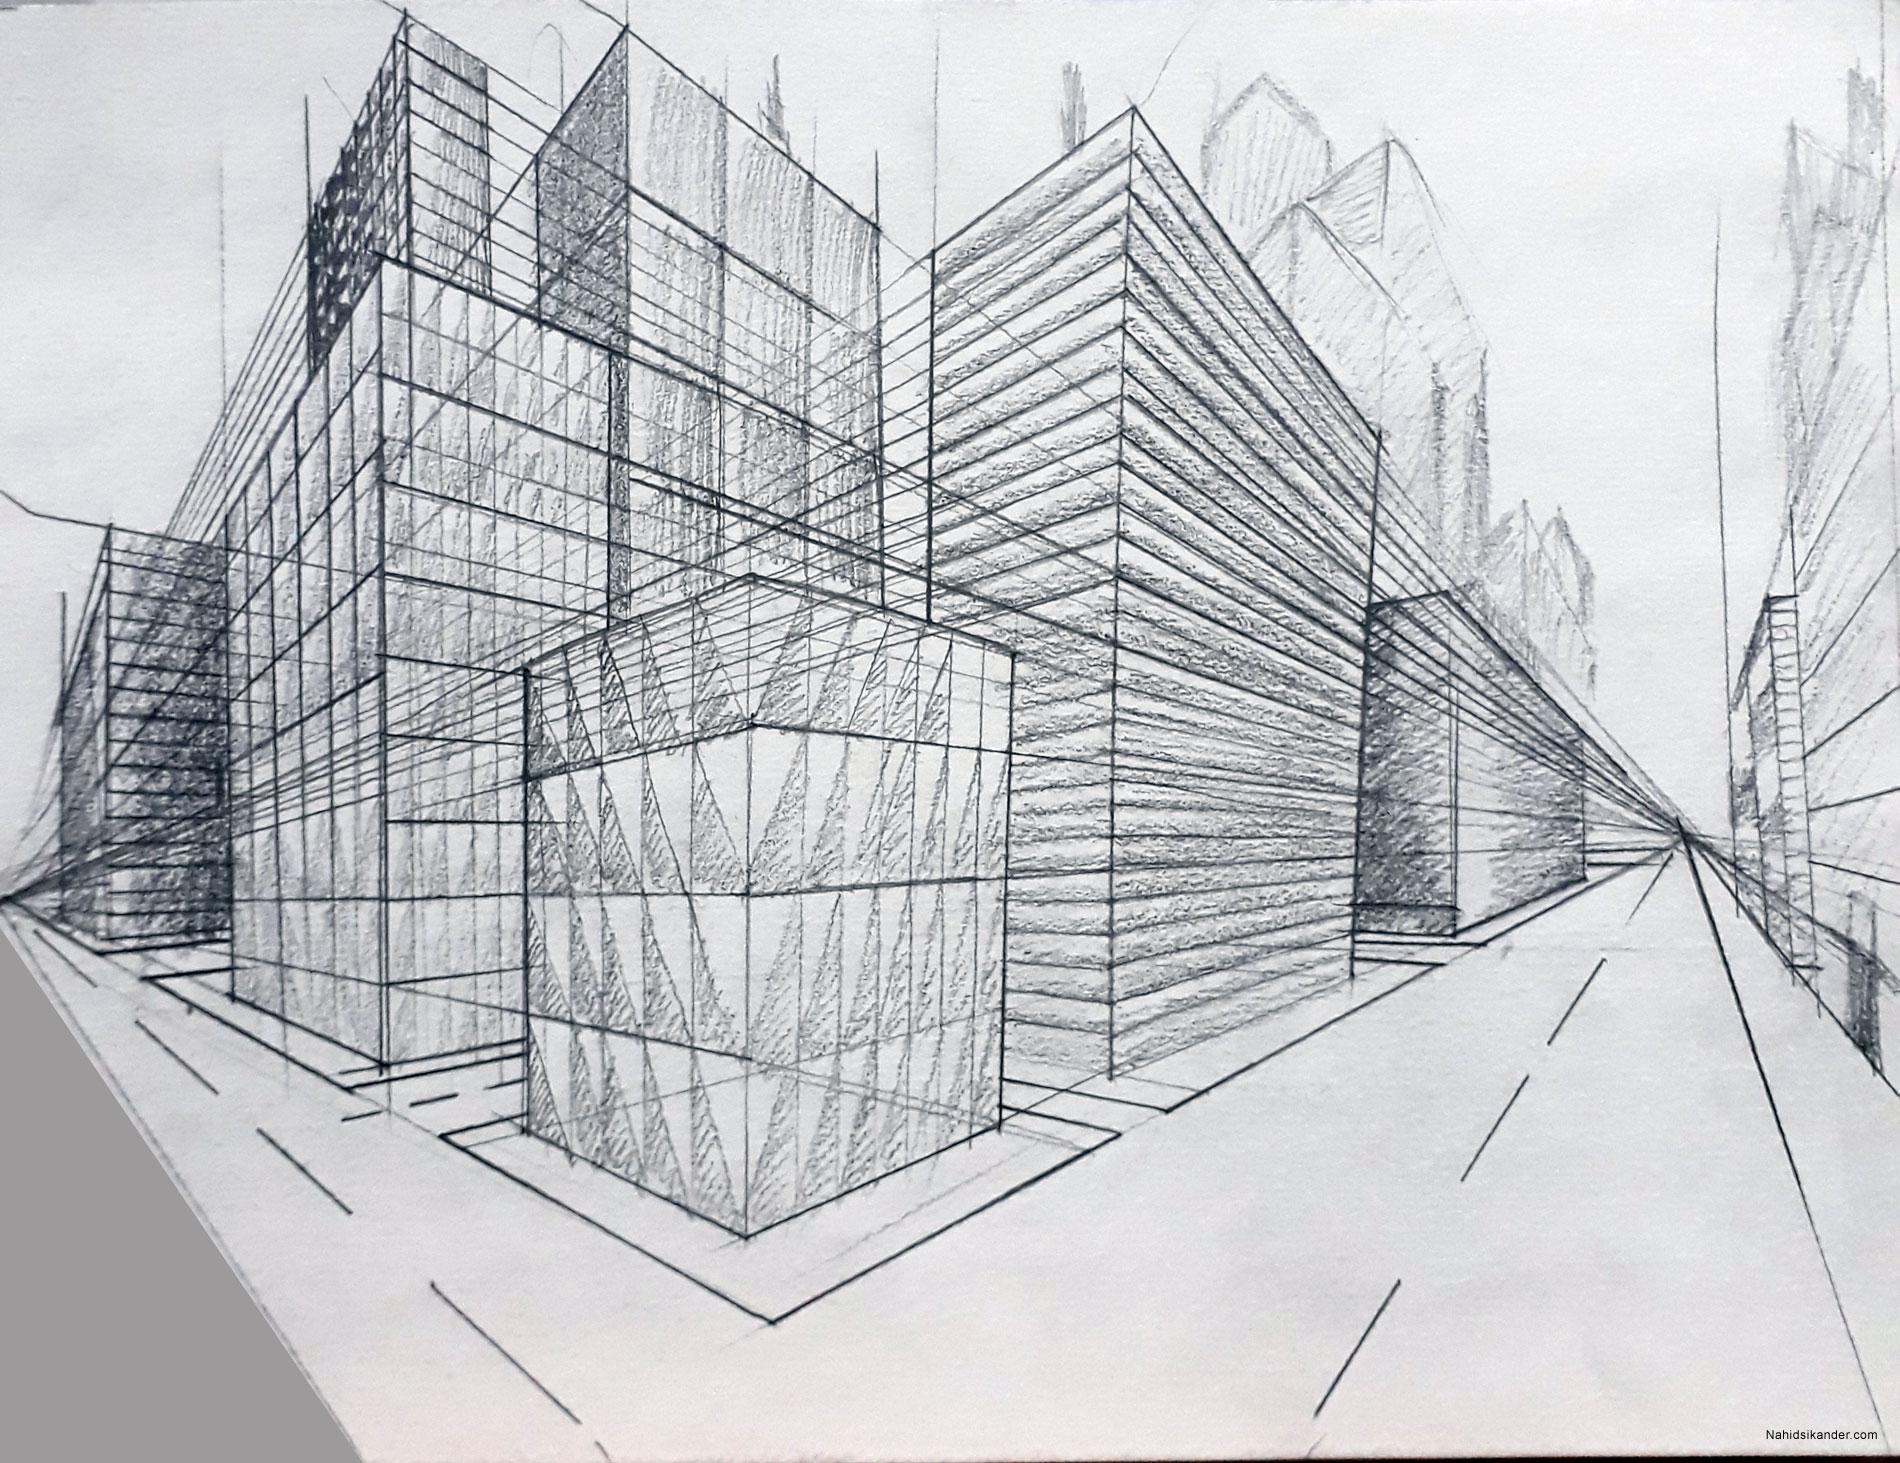 Perspective photo